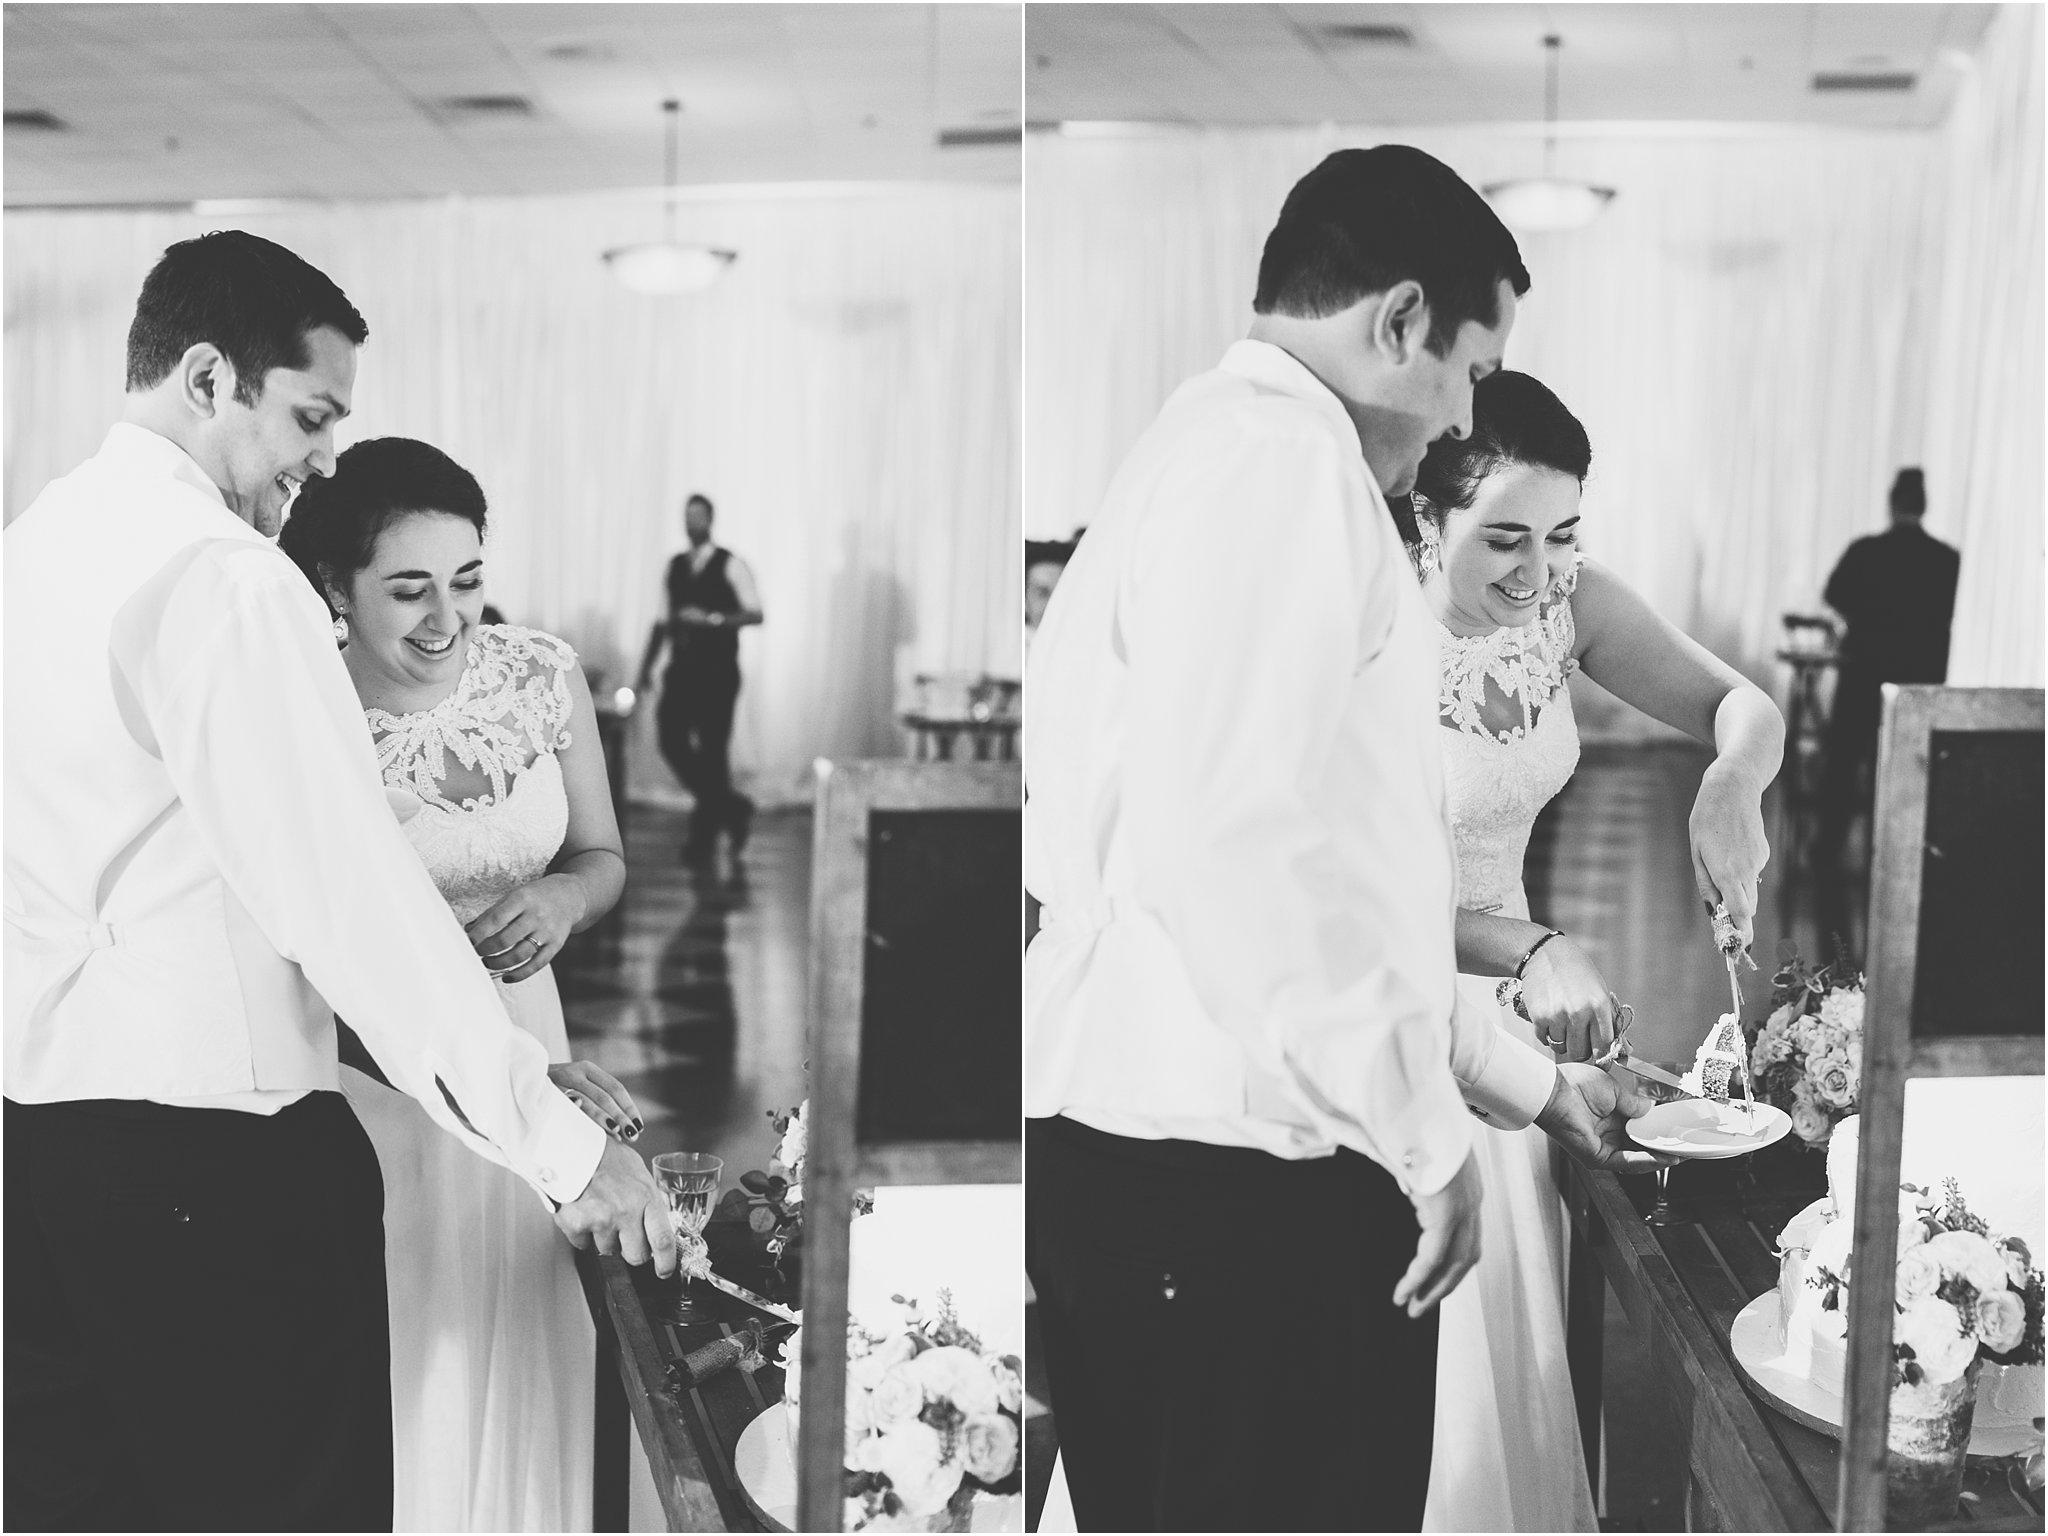 jessica_ryan_photography_virginia_wedding_photographer_wedding_hurricane_norfolk_botanical_gardens_hurricane_matthew_wedding_3636